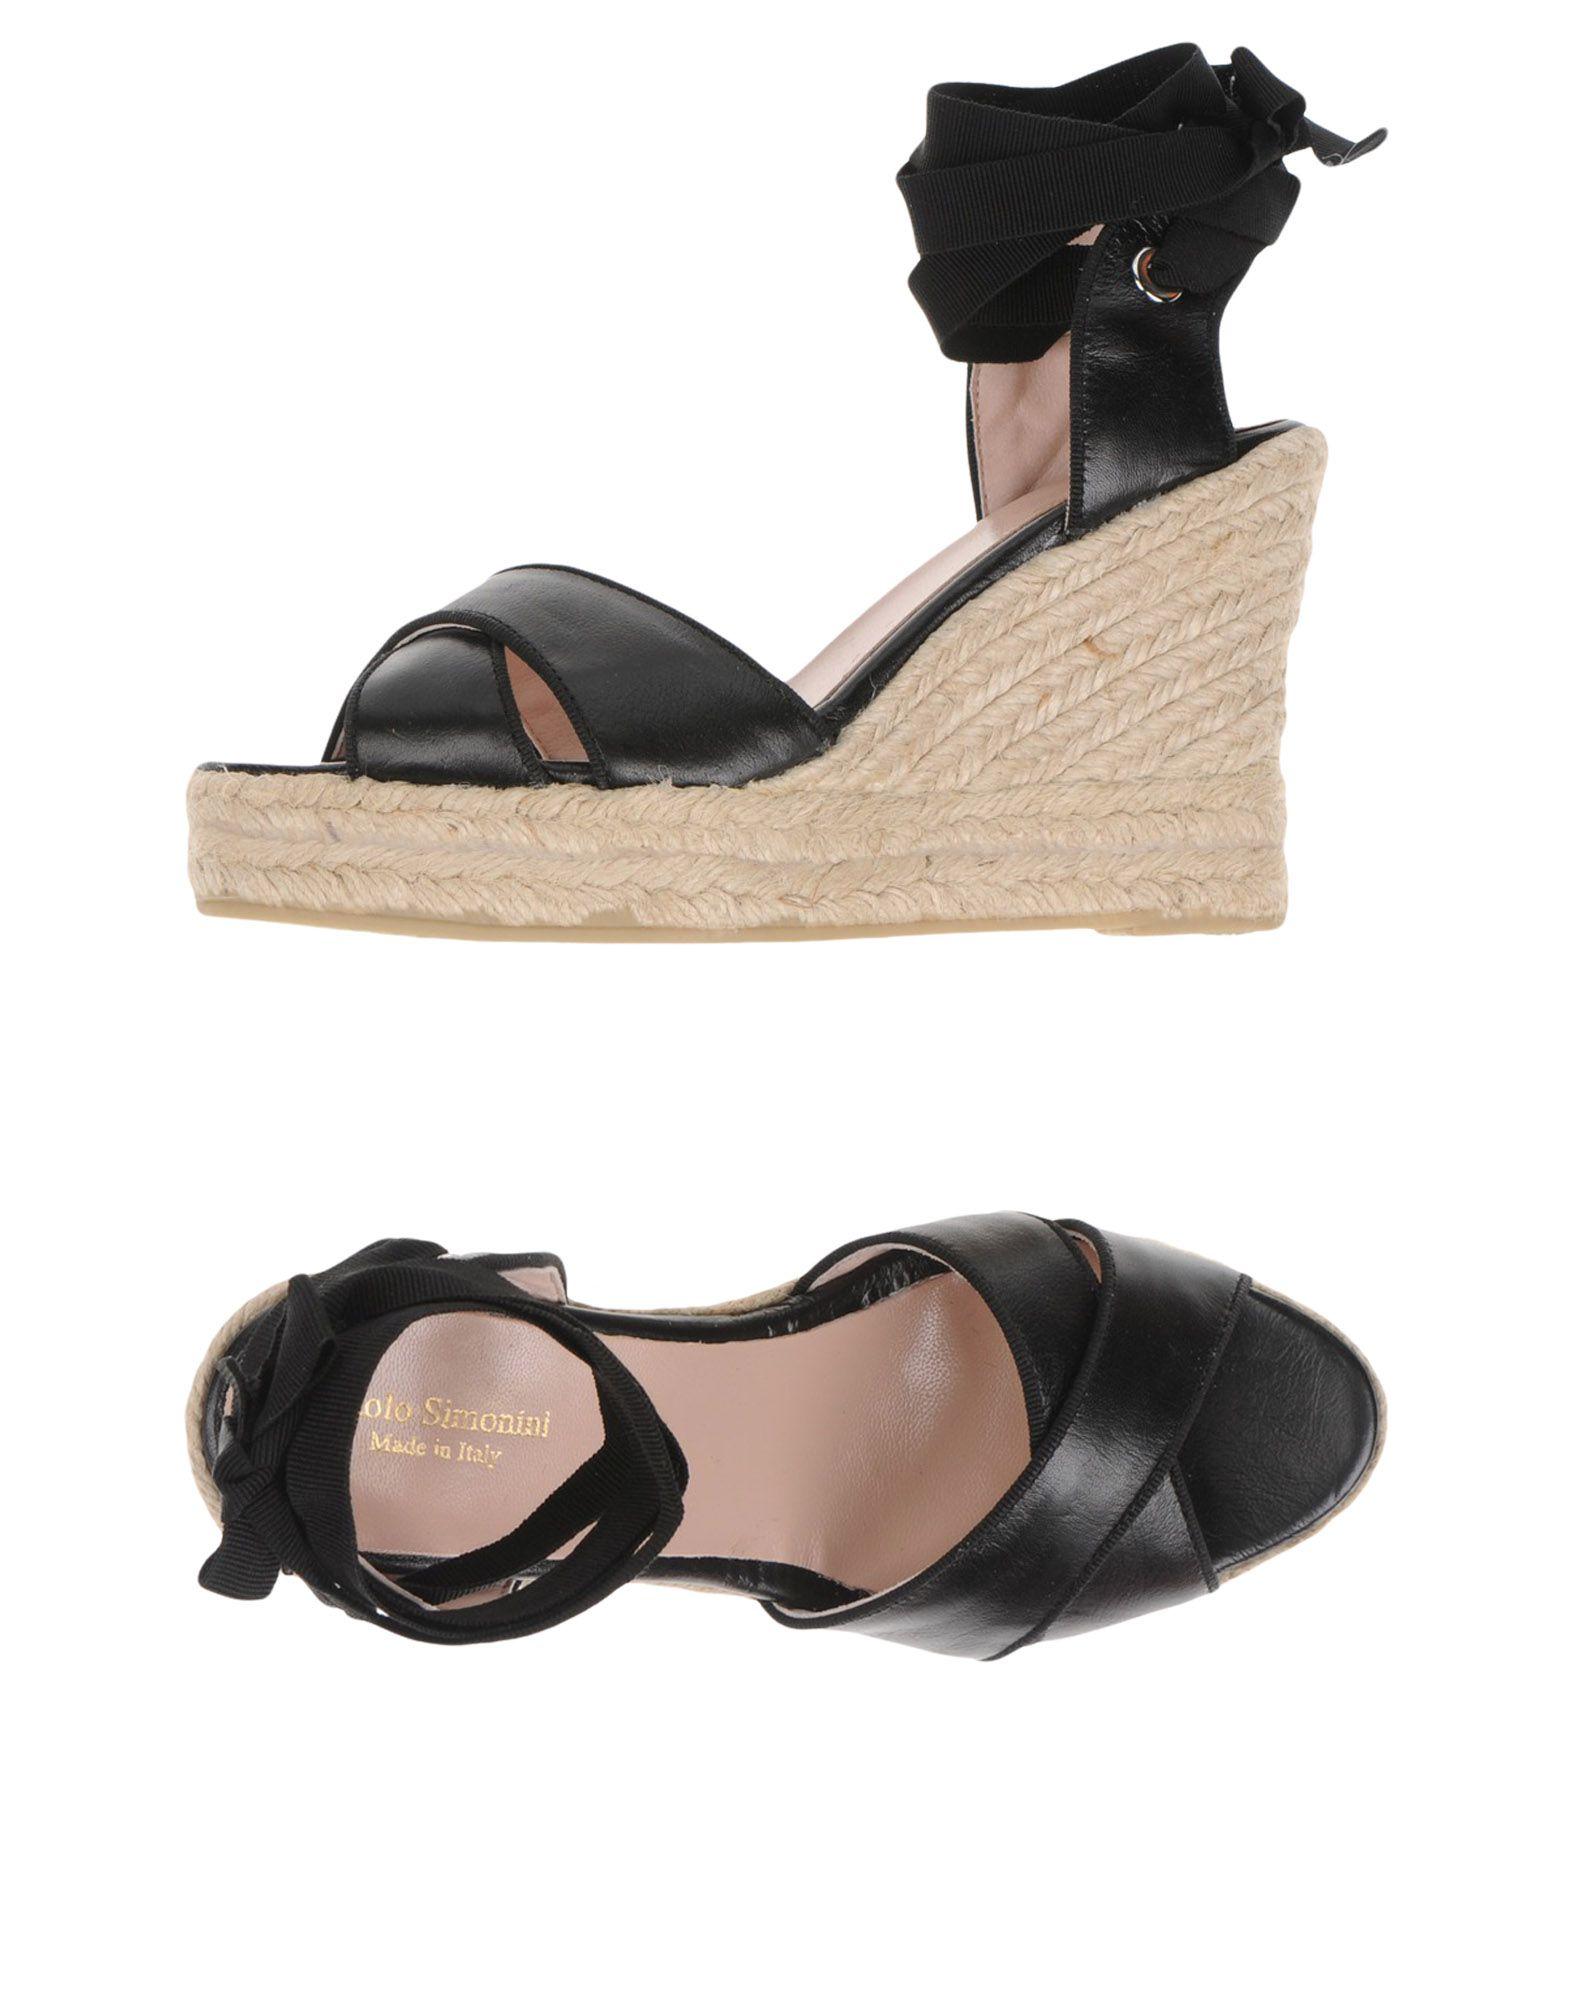 Paolo Simonini Sandalen Qualität Damen  11376050IO Gute Qualität Sandalen beliebte Schuhe adae76